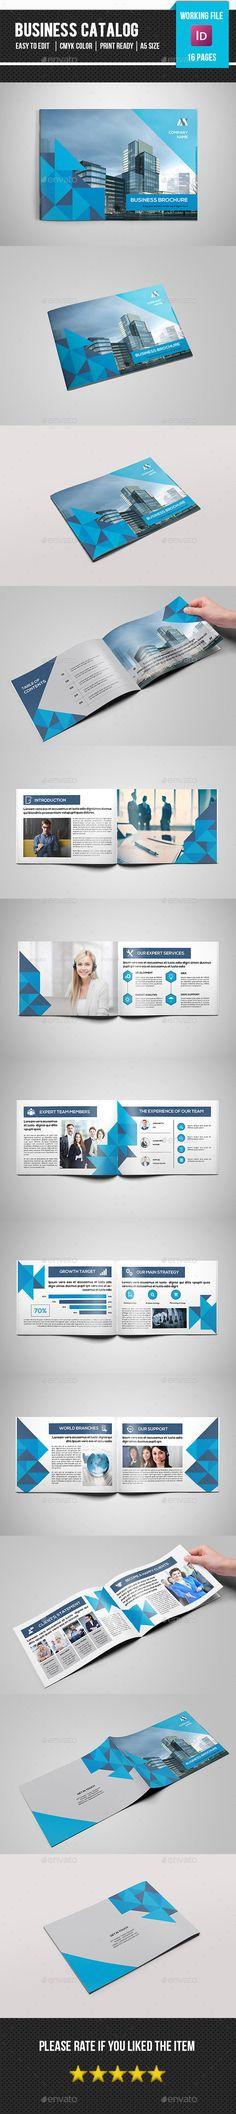 Company Catalog Template #design Download: http://graphicriver.net/item/company-catalog182/13043705?ref=ksioks